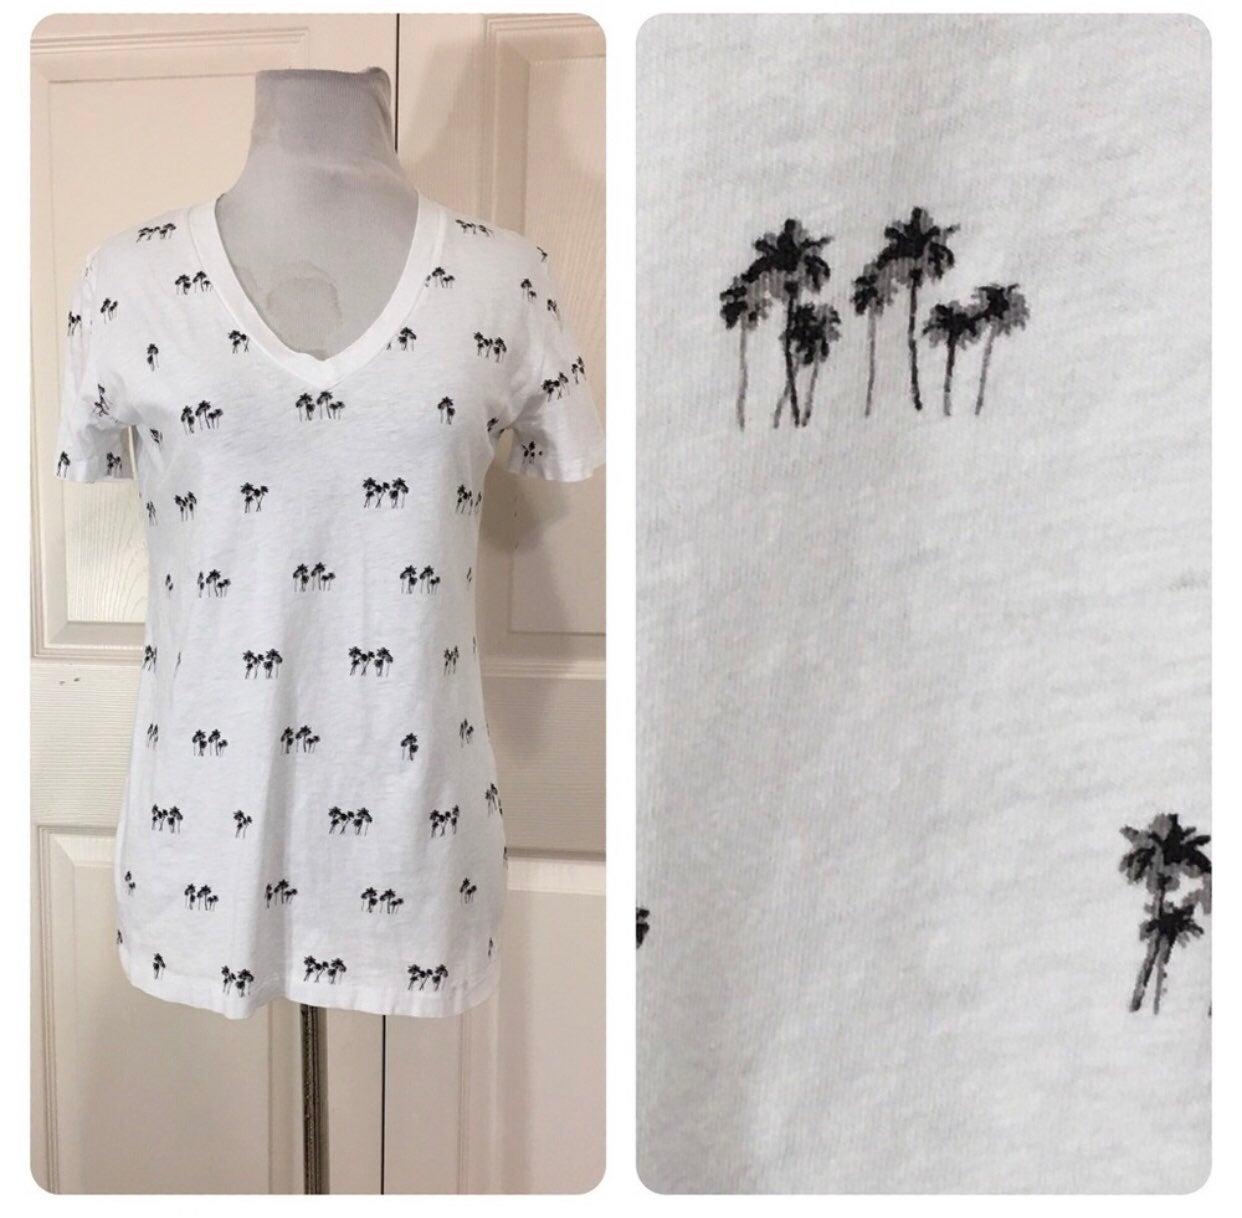 Rag & bone palm tree tee (S)